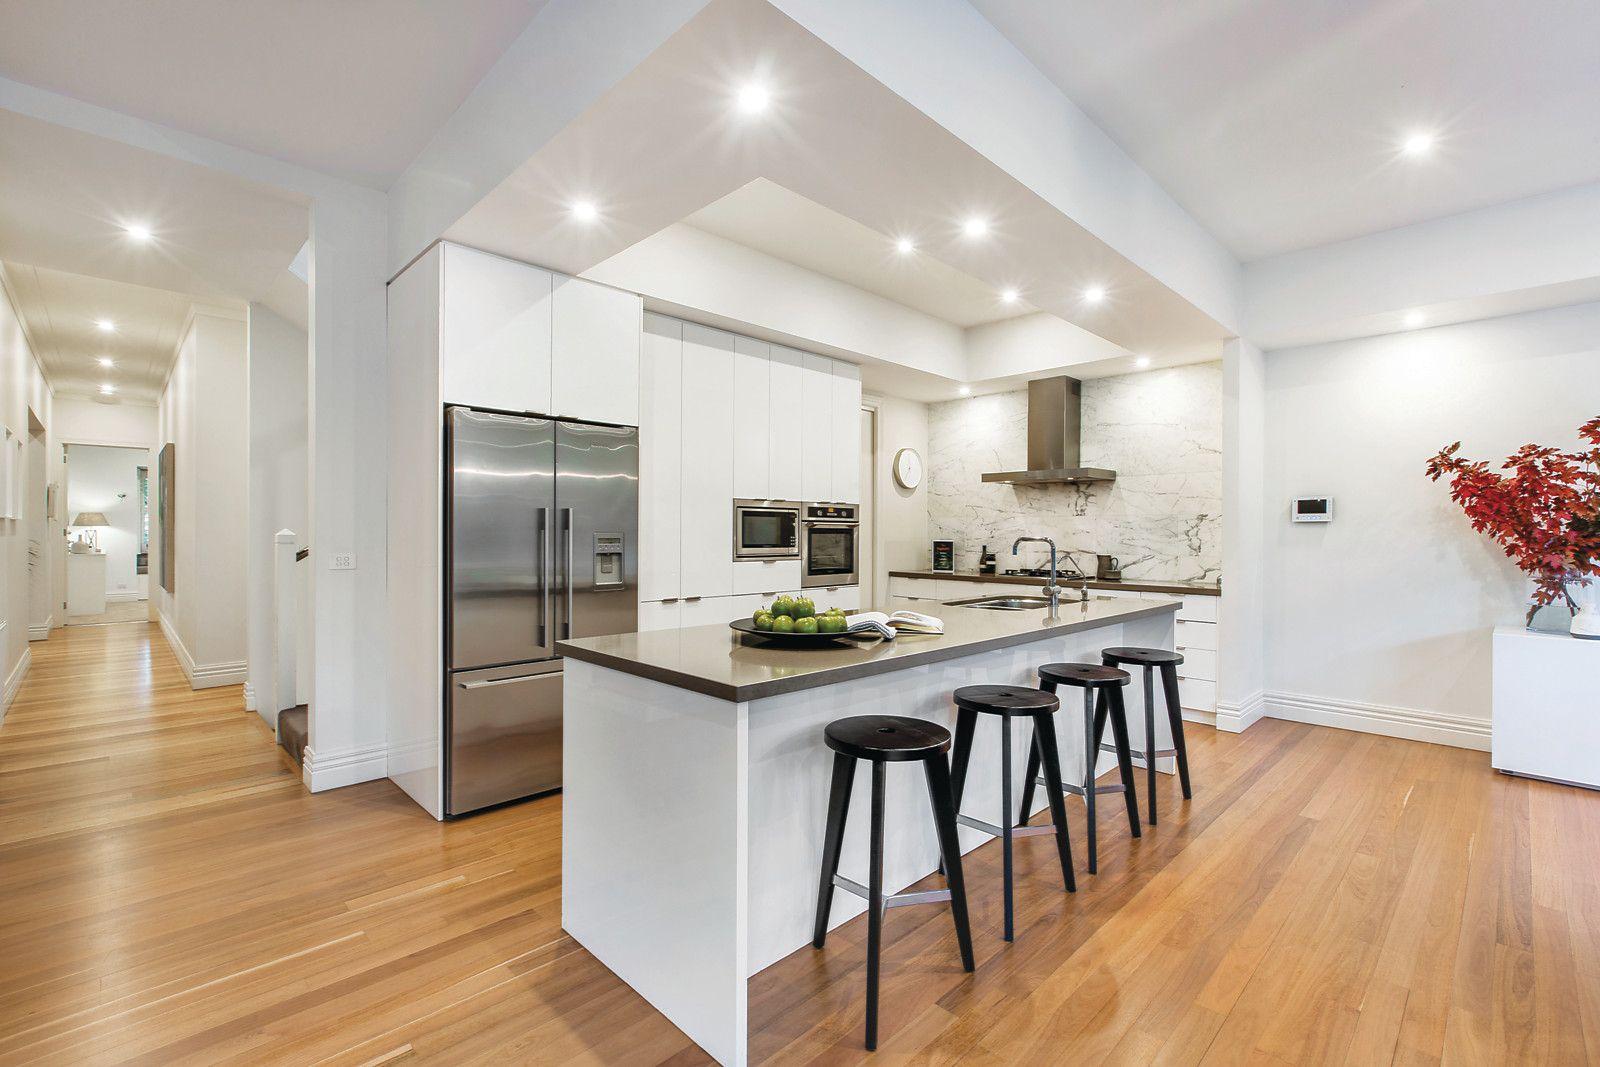 81 Kerferd Street Malvern East kitchens, White